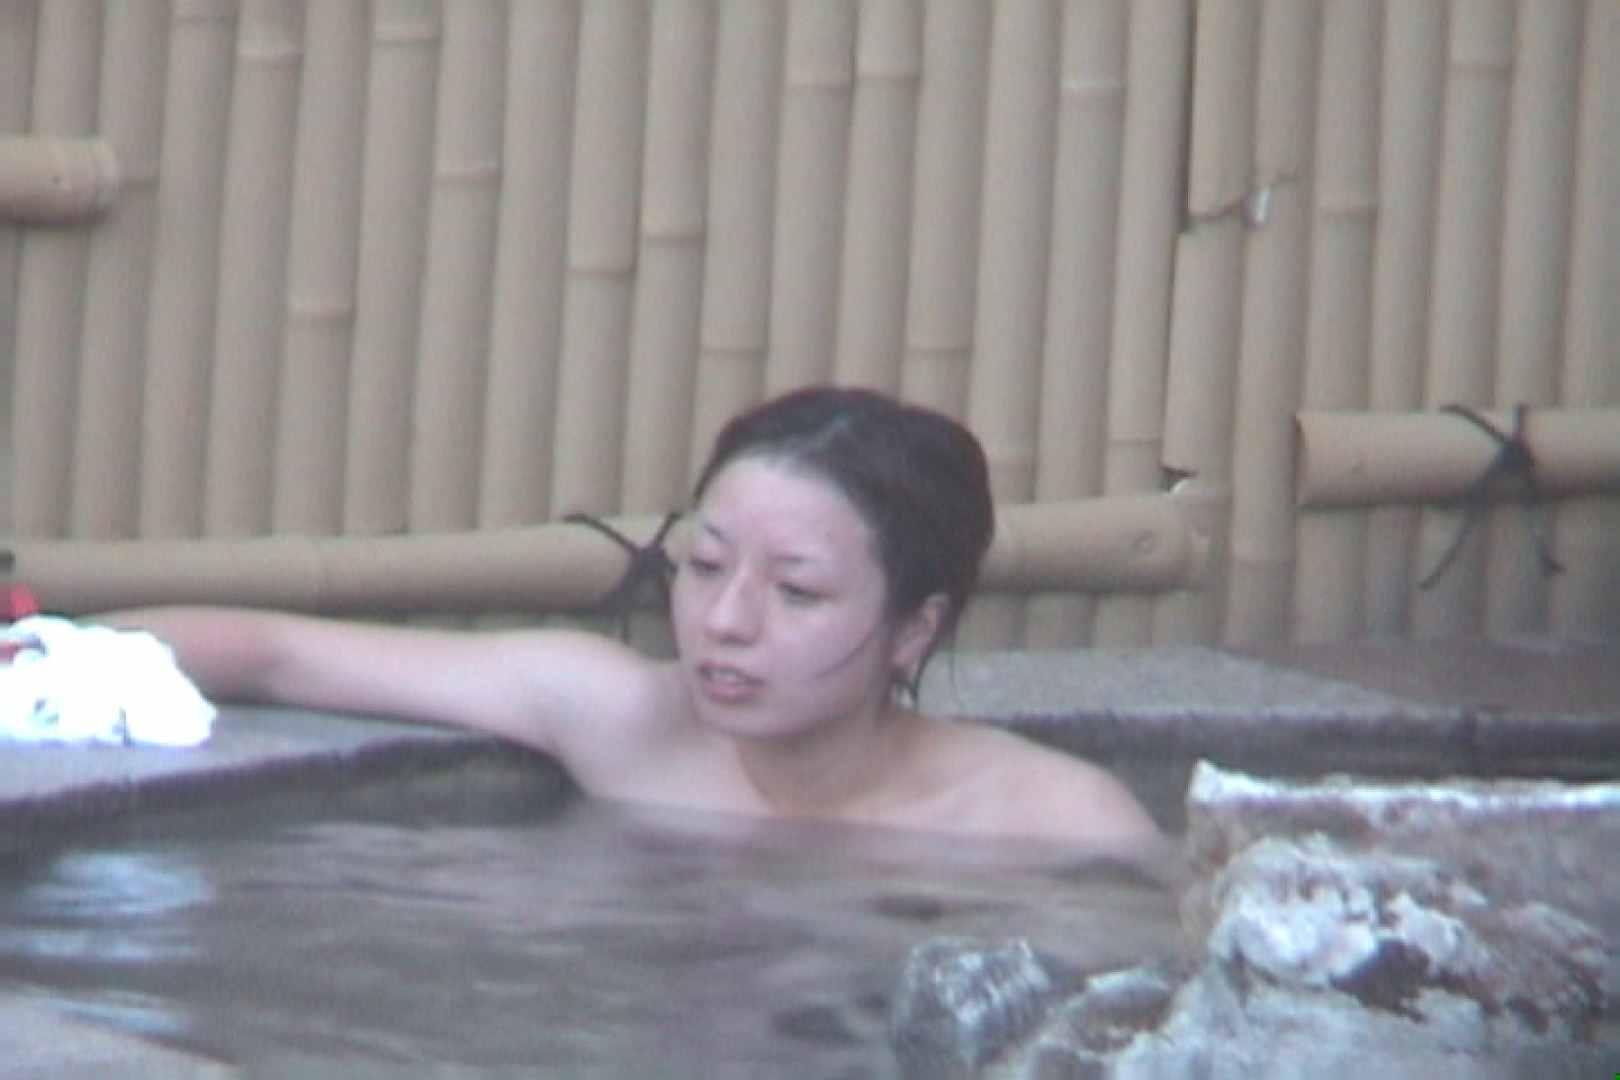 Aquaな露天風呂Vol.608 美しいOLの裸体 AV動画キャプチャ 95pic 53